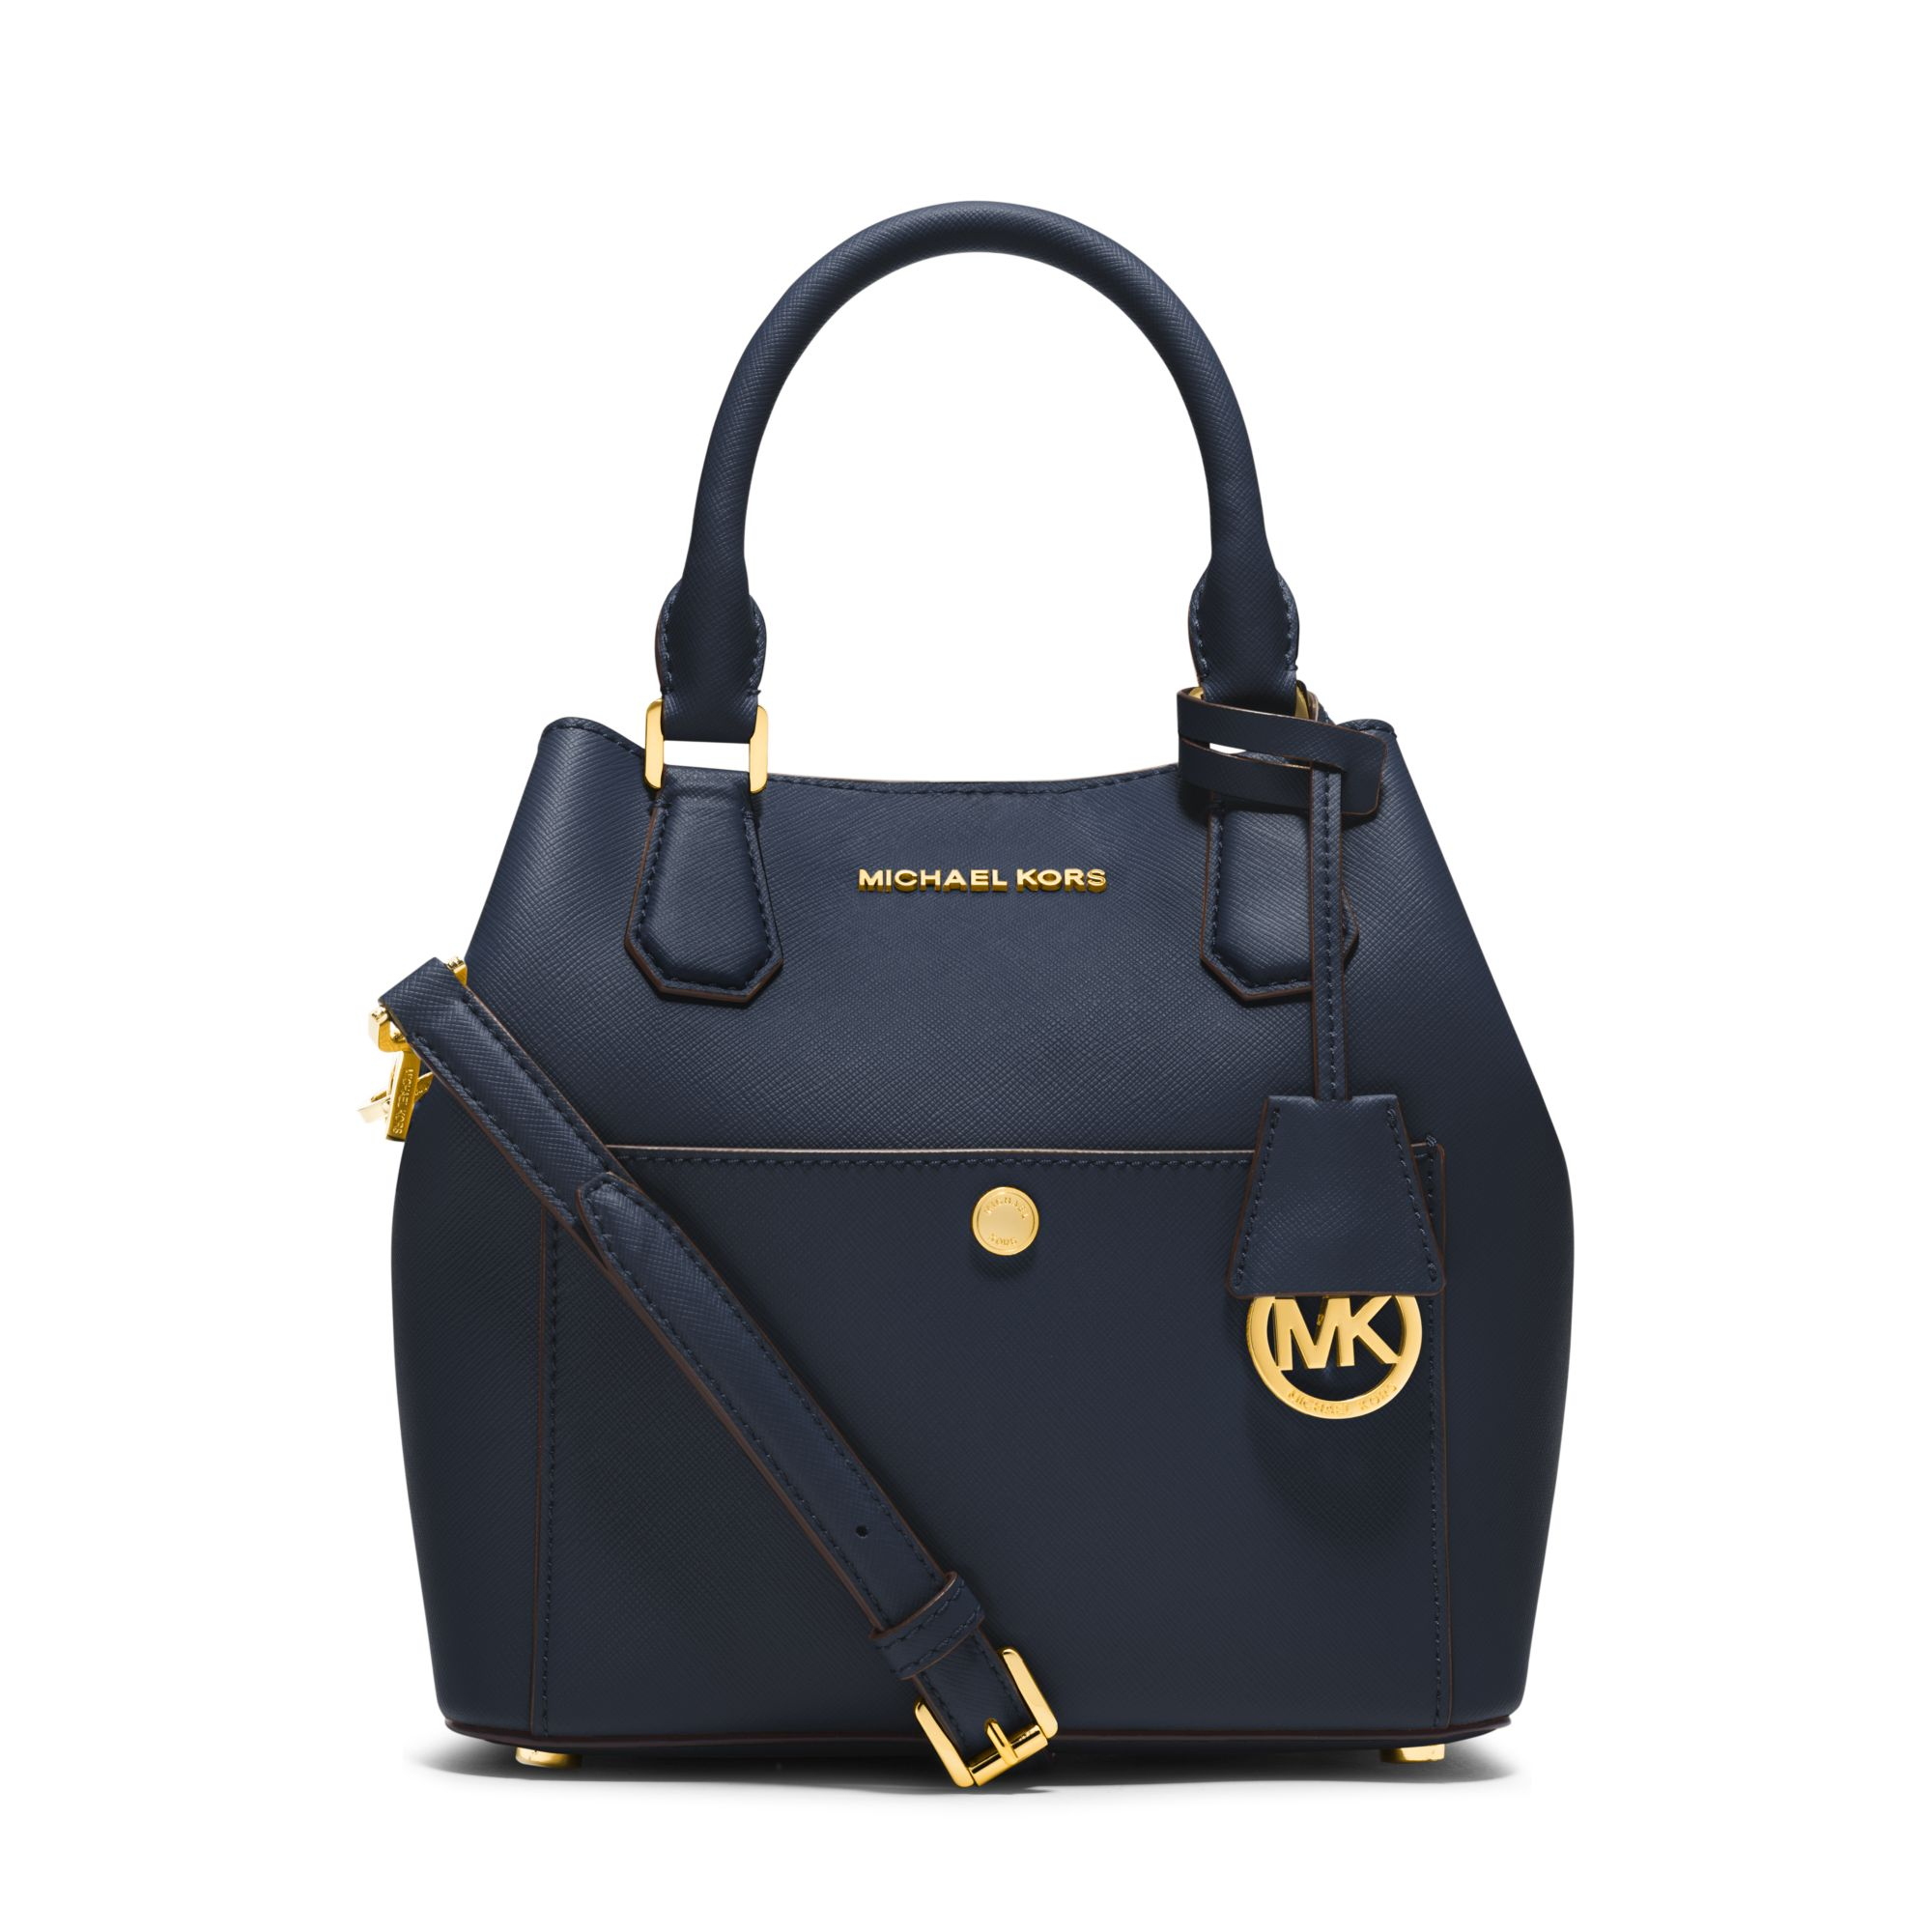 89fdd5854fa0 ... czech lyst michael kors greenwich medium saffiano leather satchel in  blue d91b1 c9e91